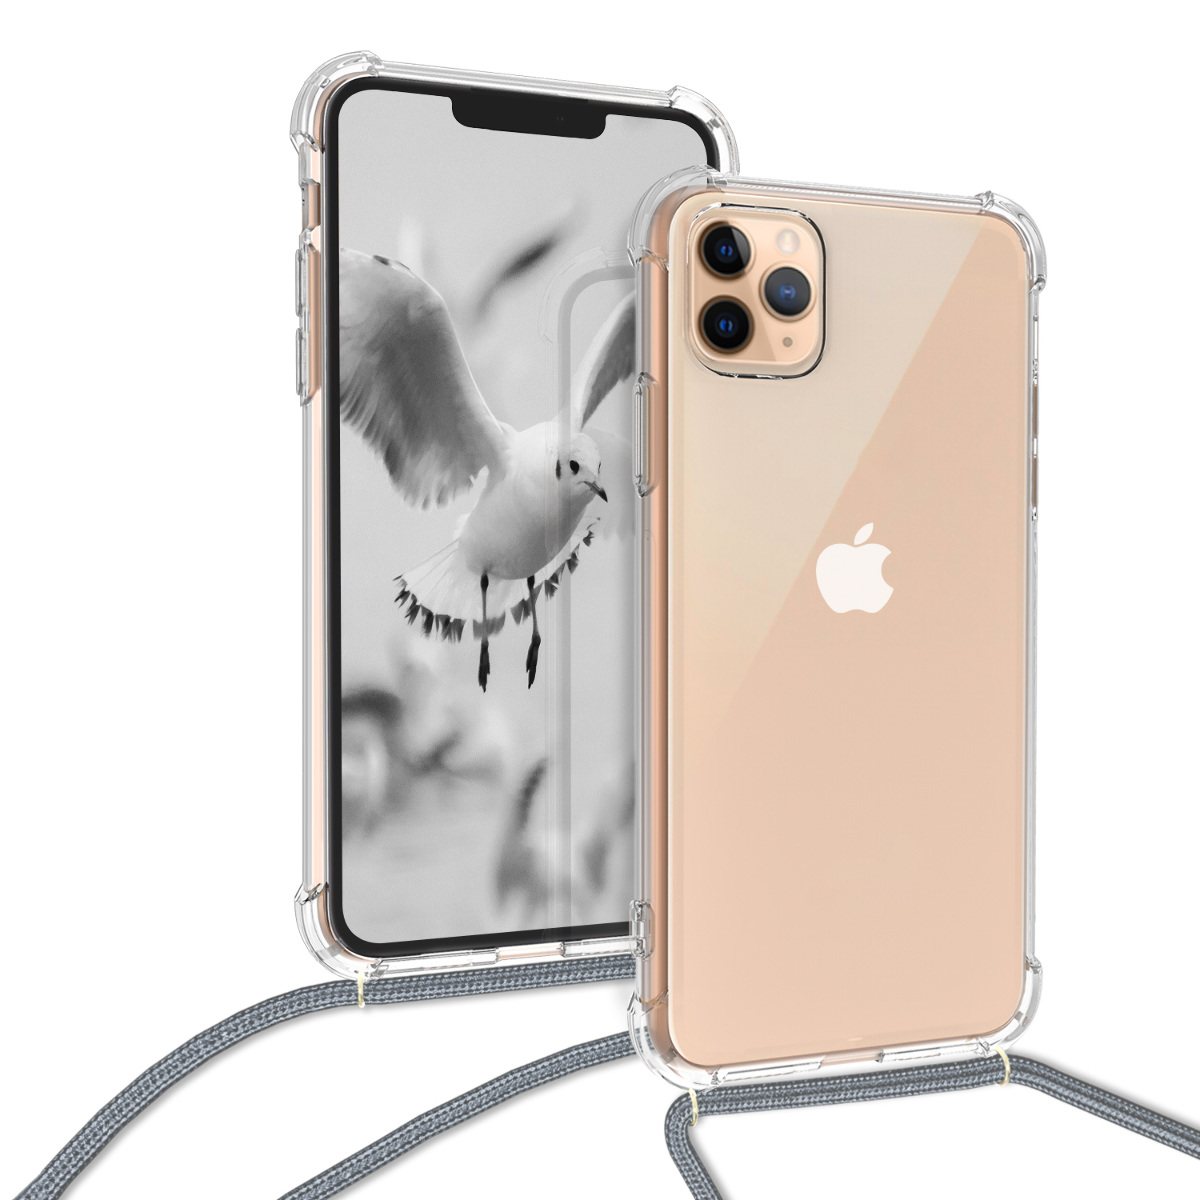 KW Θήκη Σιλικόνης με Λουράκι iPhone 11 Pro - Transparent (49739.02)